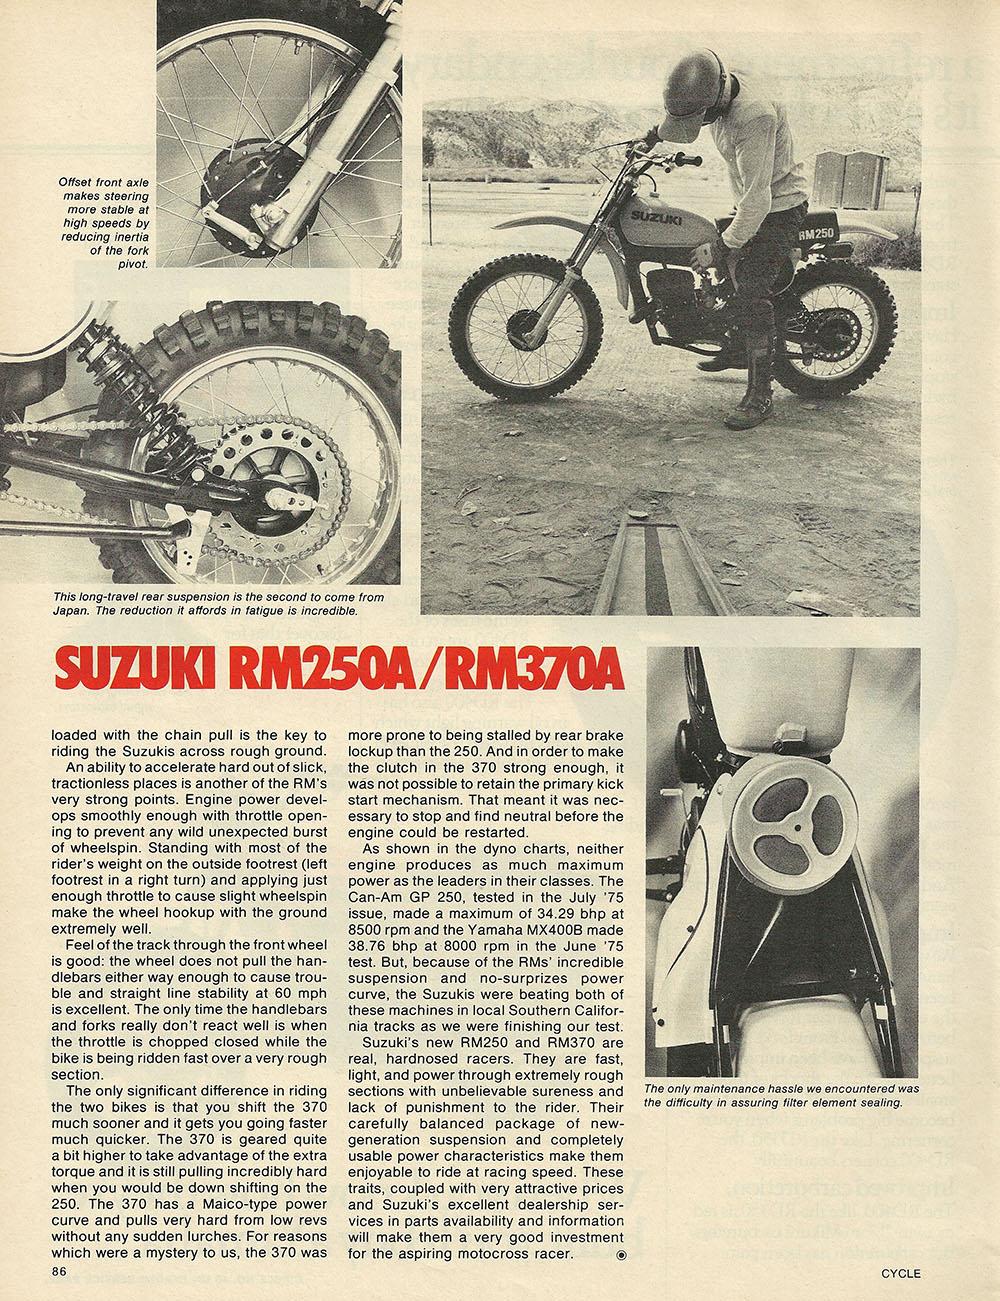 1975 Suzuki RM250 and RM370 off road test 7.JPG